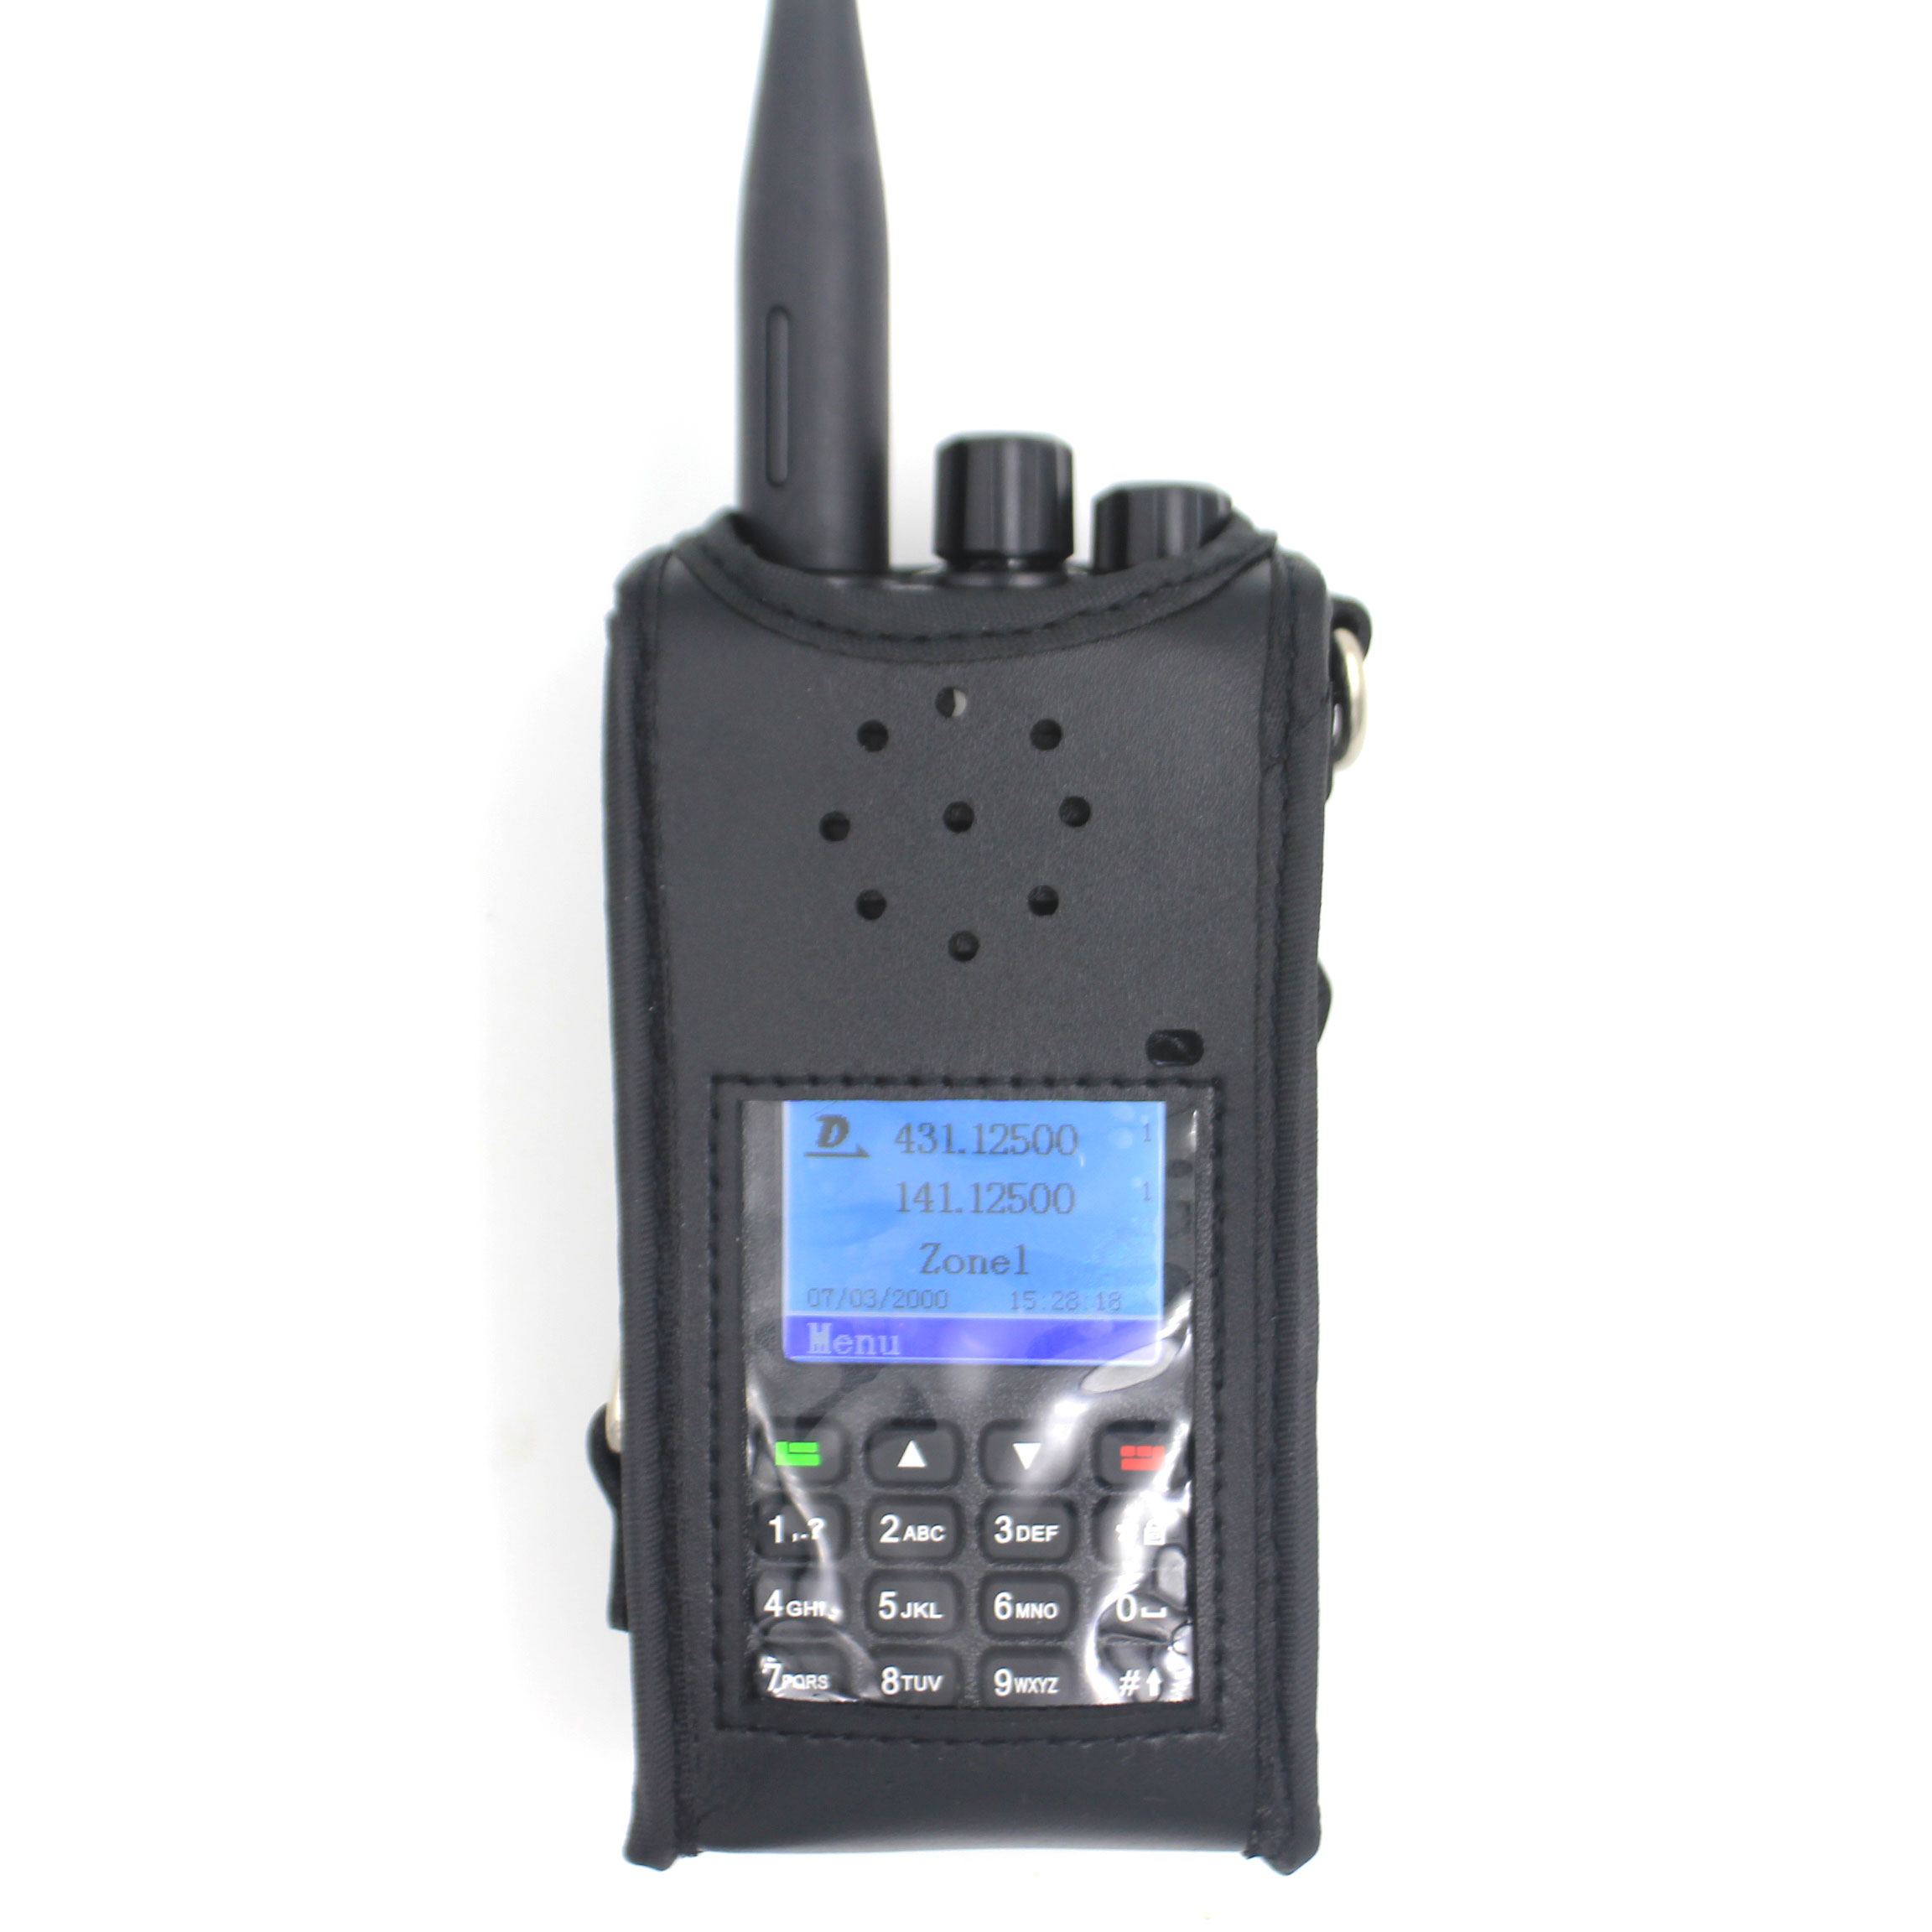 Portable Radio Case For TYT MD-UV380 MD-UV390 Baofeng UV-9R Plus BF-A58 BF-9700 GT-3WP PVC Protect Bag For UV-5S Walkie Talkies